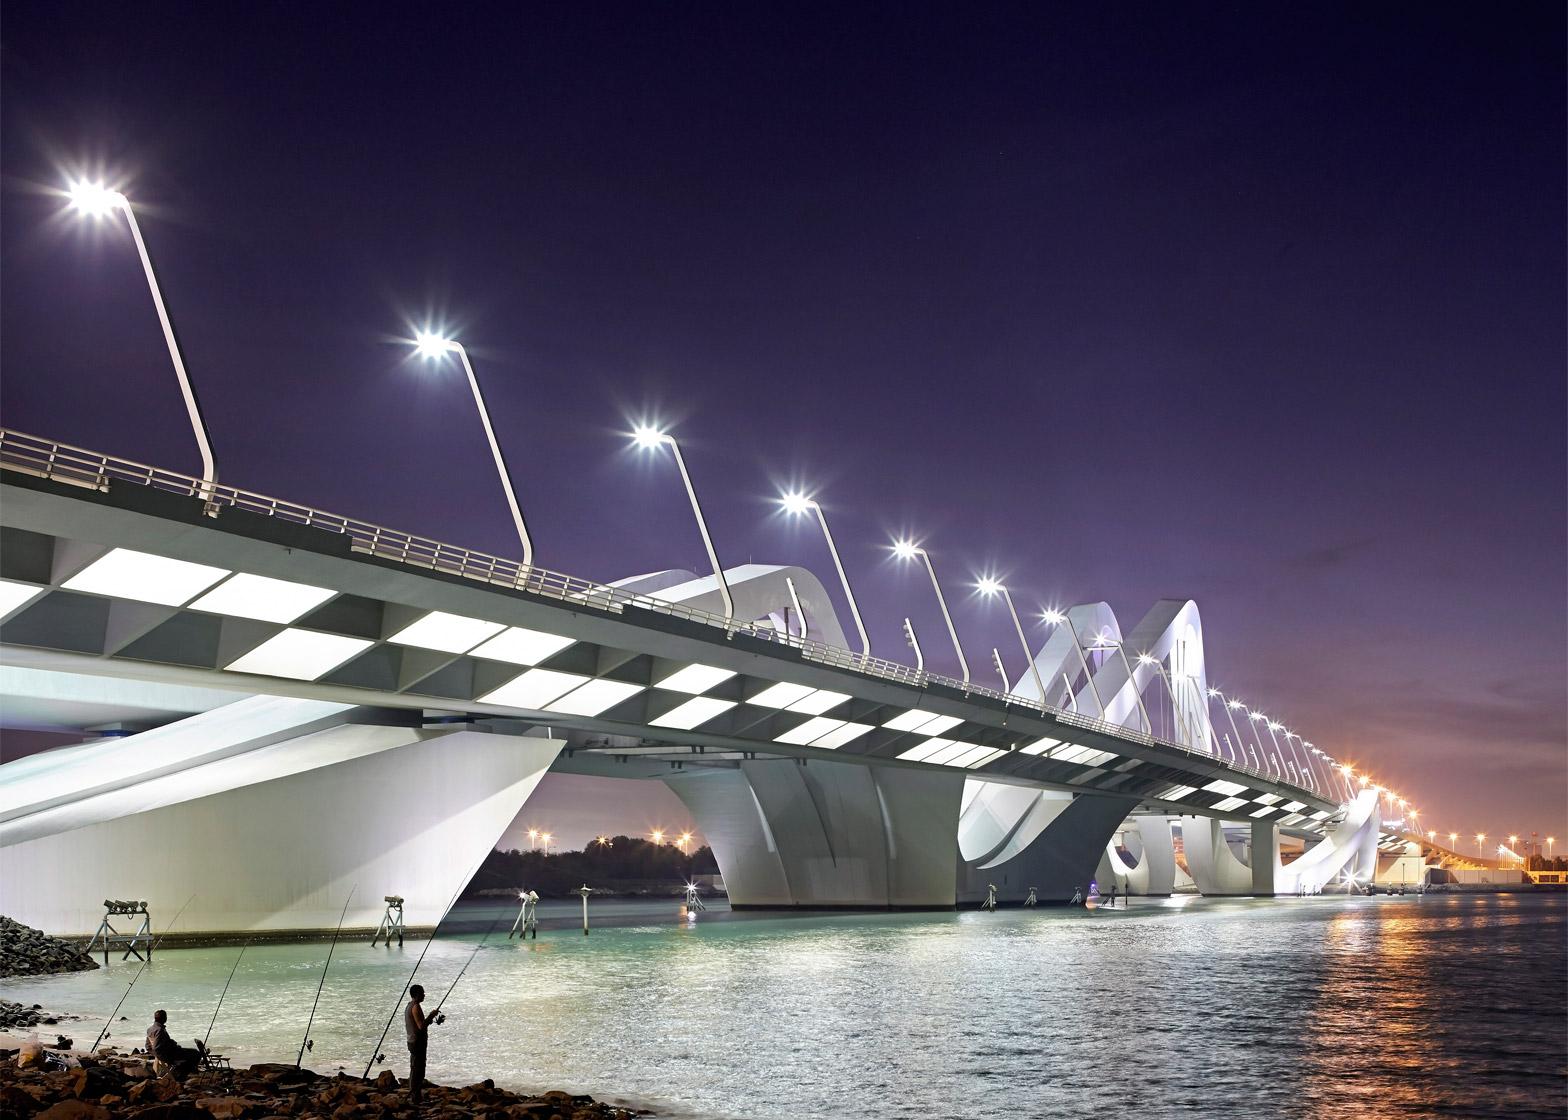 Sheikh Zayed Bridge, Abu Dhabi, UAE, 2010